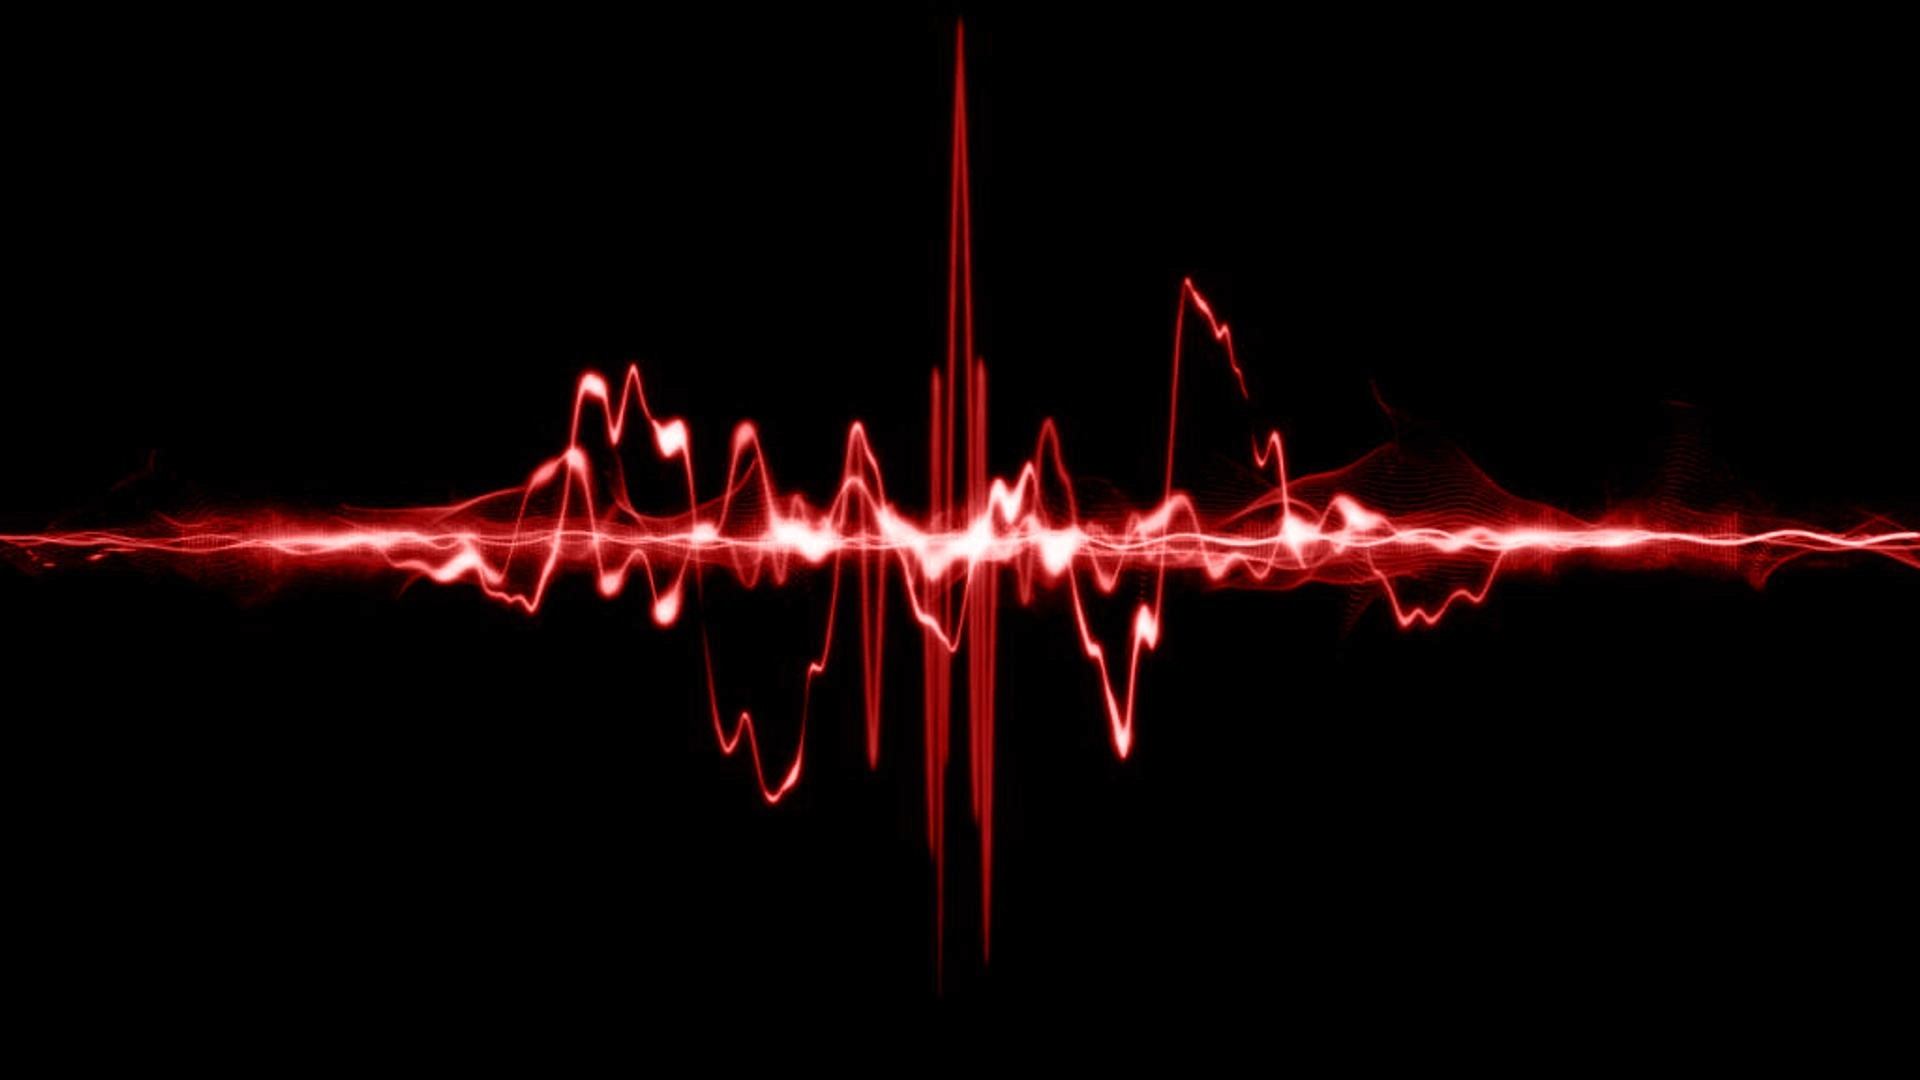 Red sound waves wallpaper 14398 1920x1080